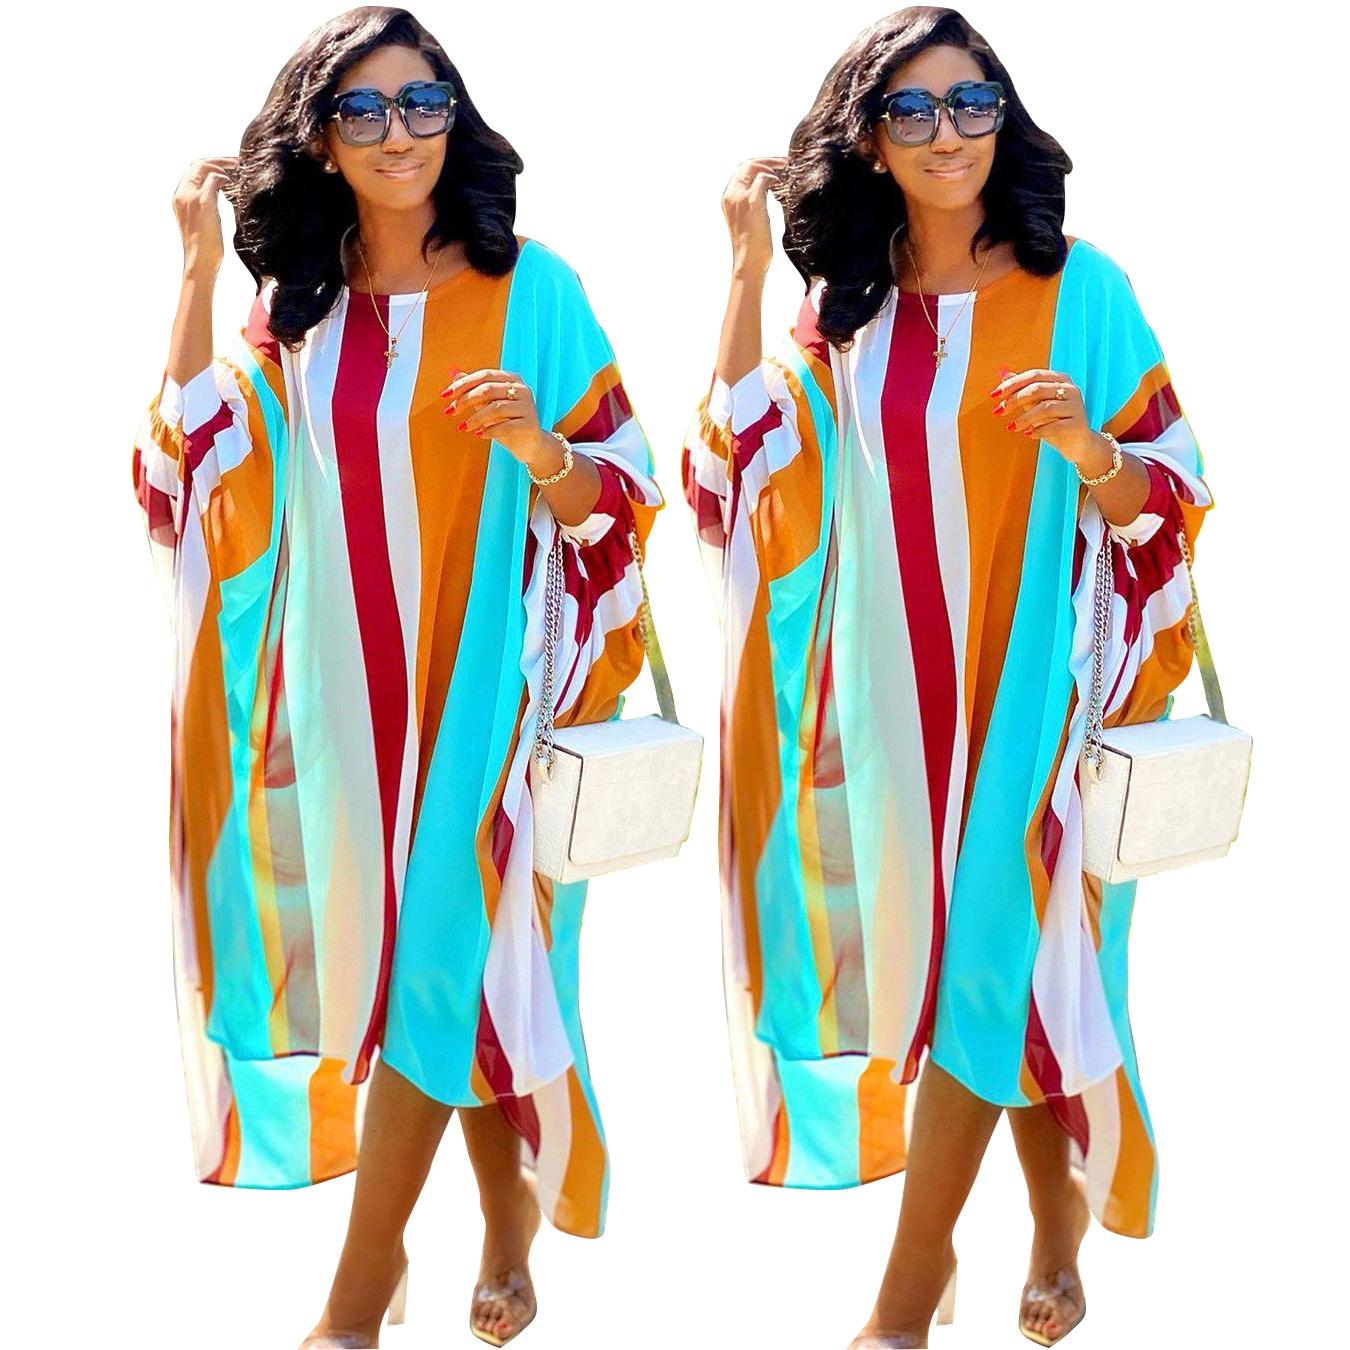 European and American Women's Fashion Casual Elegant Loose Striped Printed Dress